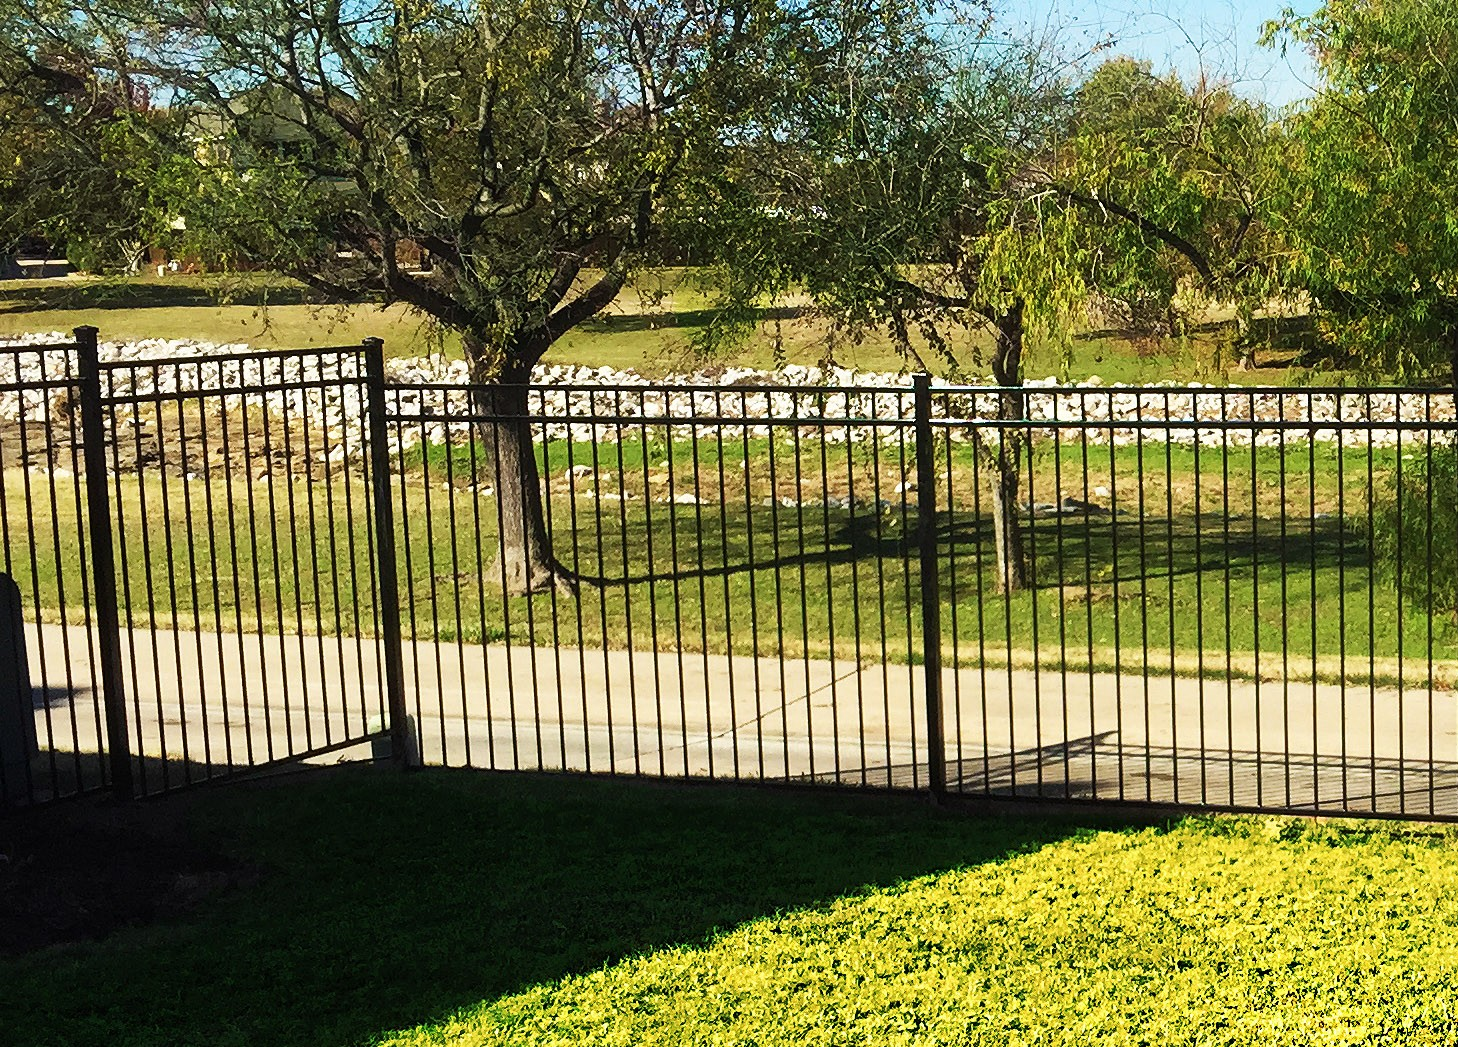 Wrought Iron Fences |Lifetime Fence Company | Steel Fences